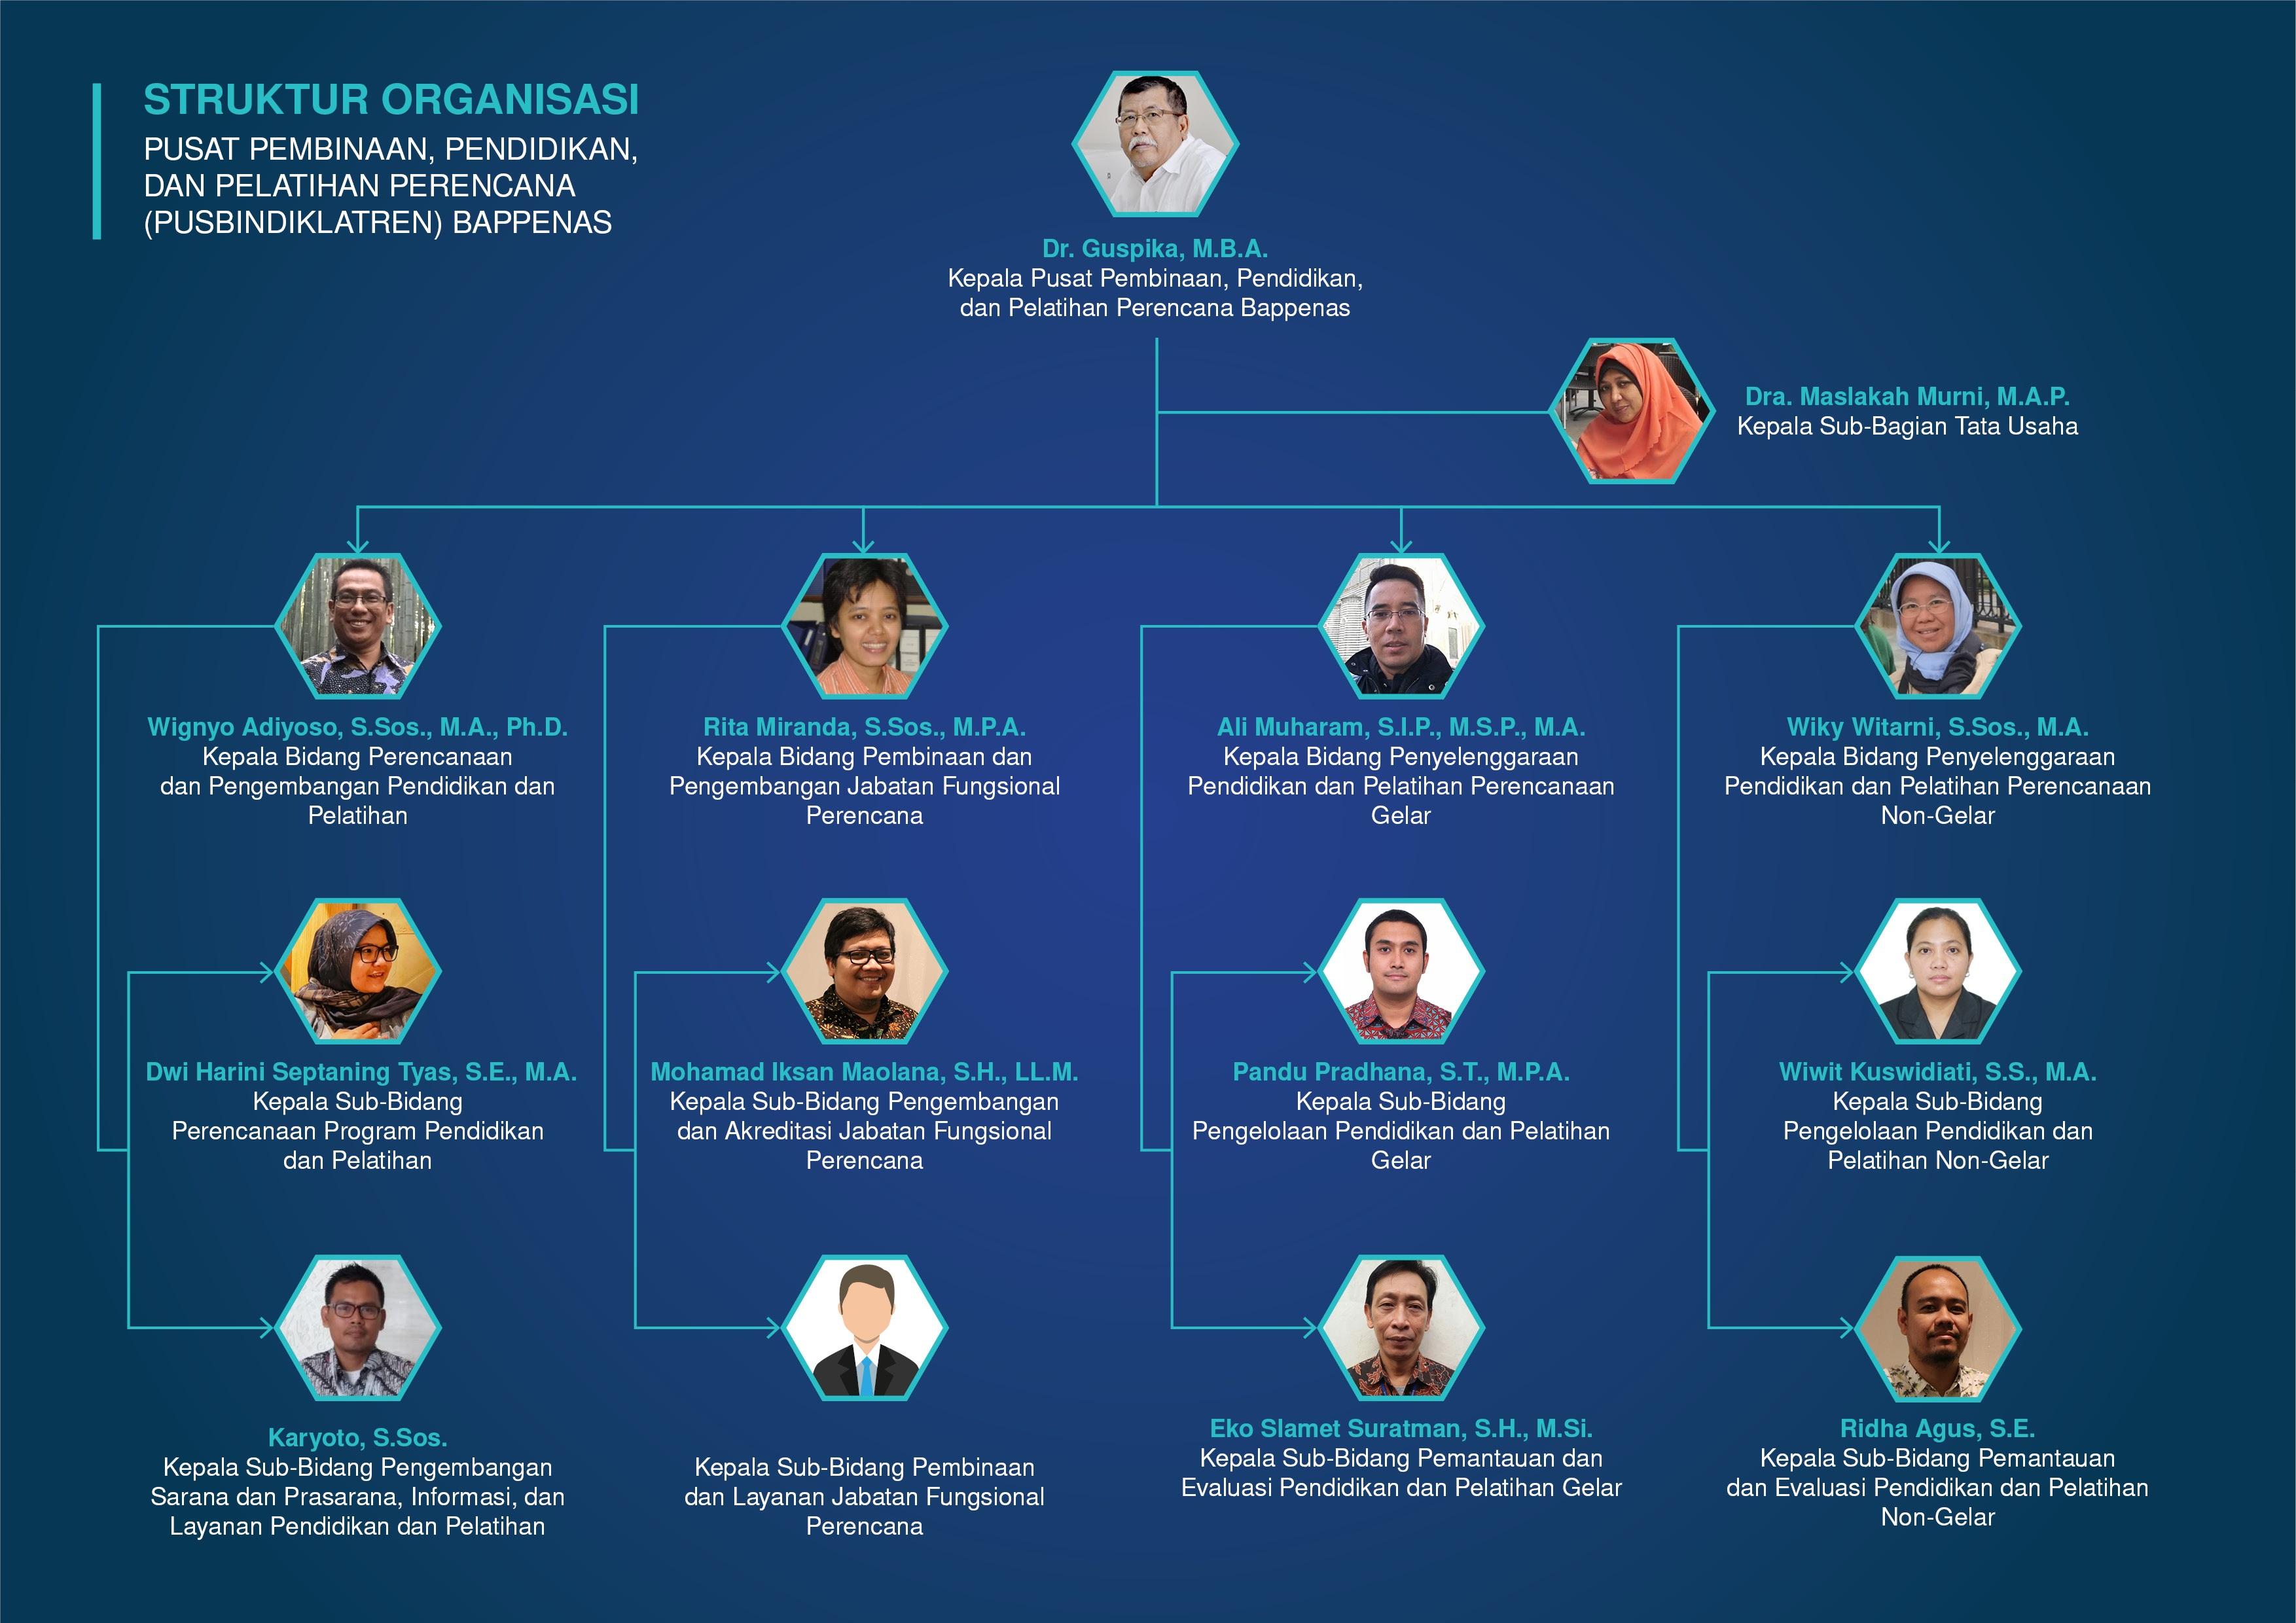 struktur organisasi pusbindiklatren